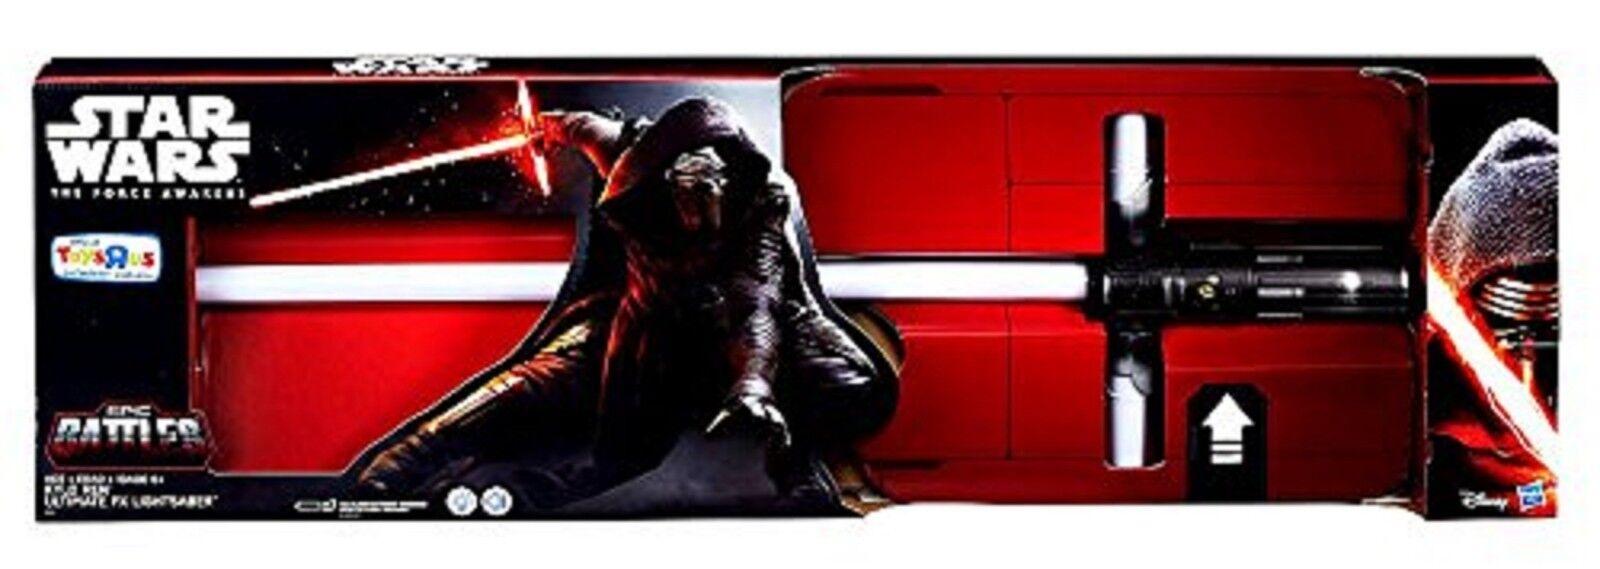 Star Wars Kylo Ren Ultimate FX Lightsaber Ages 6+ Hasbro Light Saber New Toy Fun